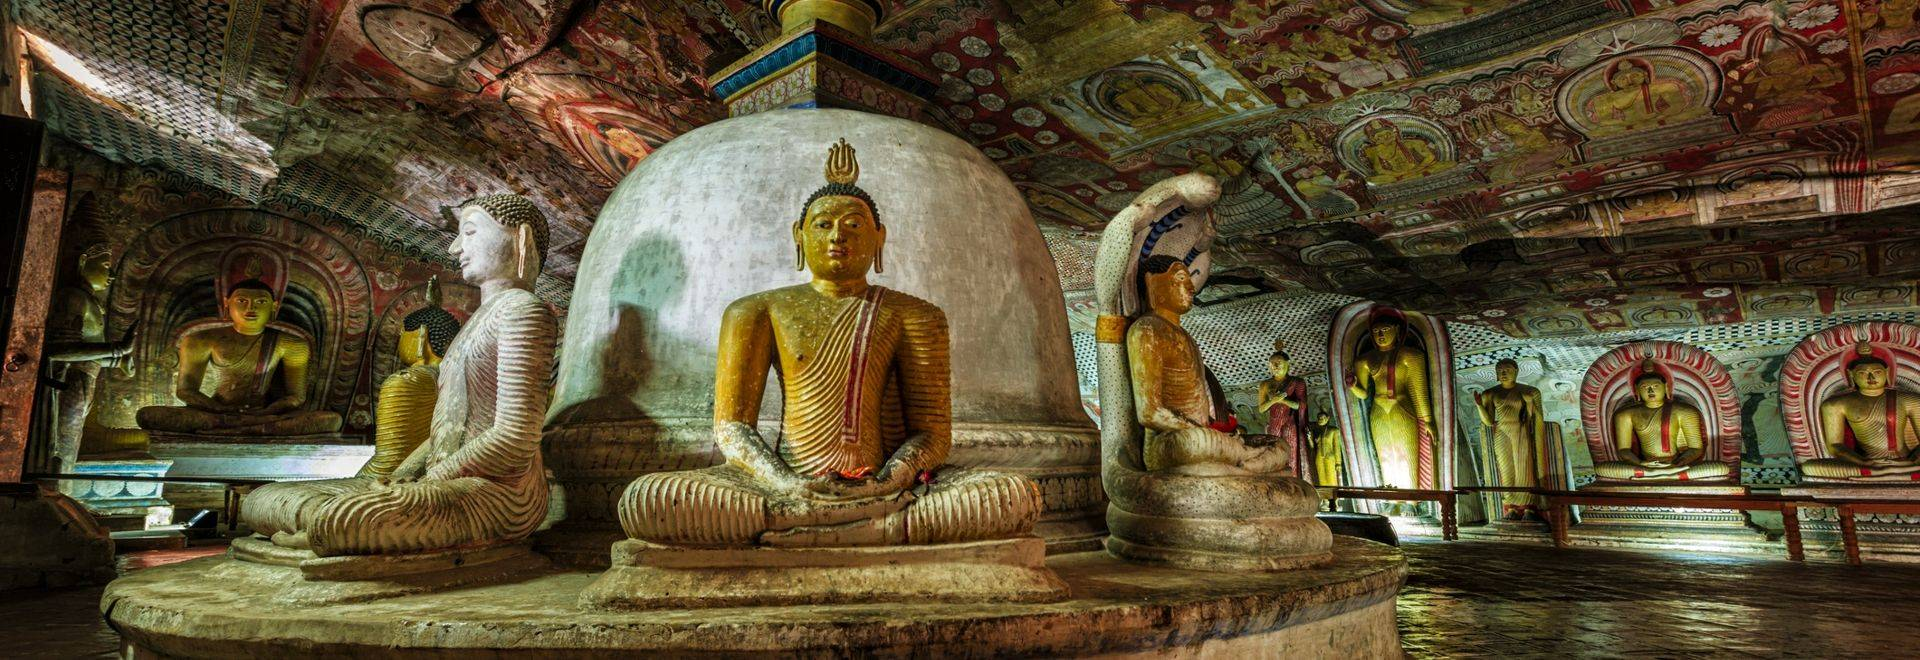 Buddha statue inside Dambulla cave temple, Sri Lanka. Dambulla cave temple also known as the Golden Temple of Dambulla is a …